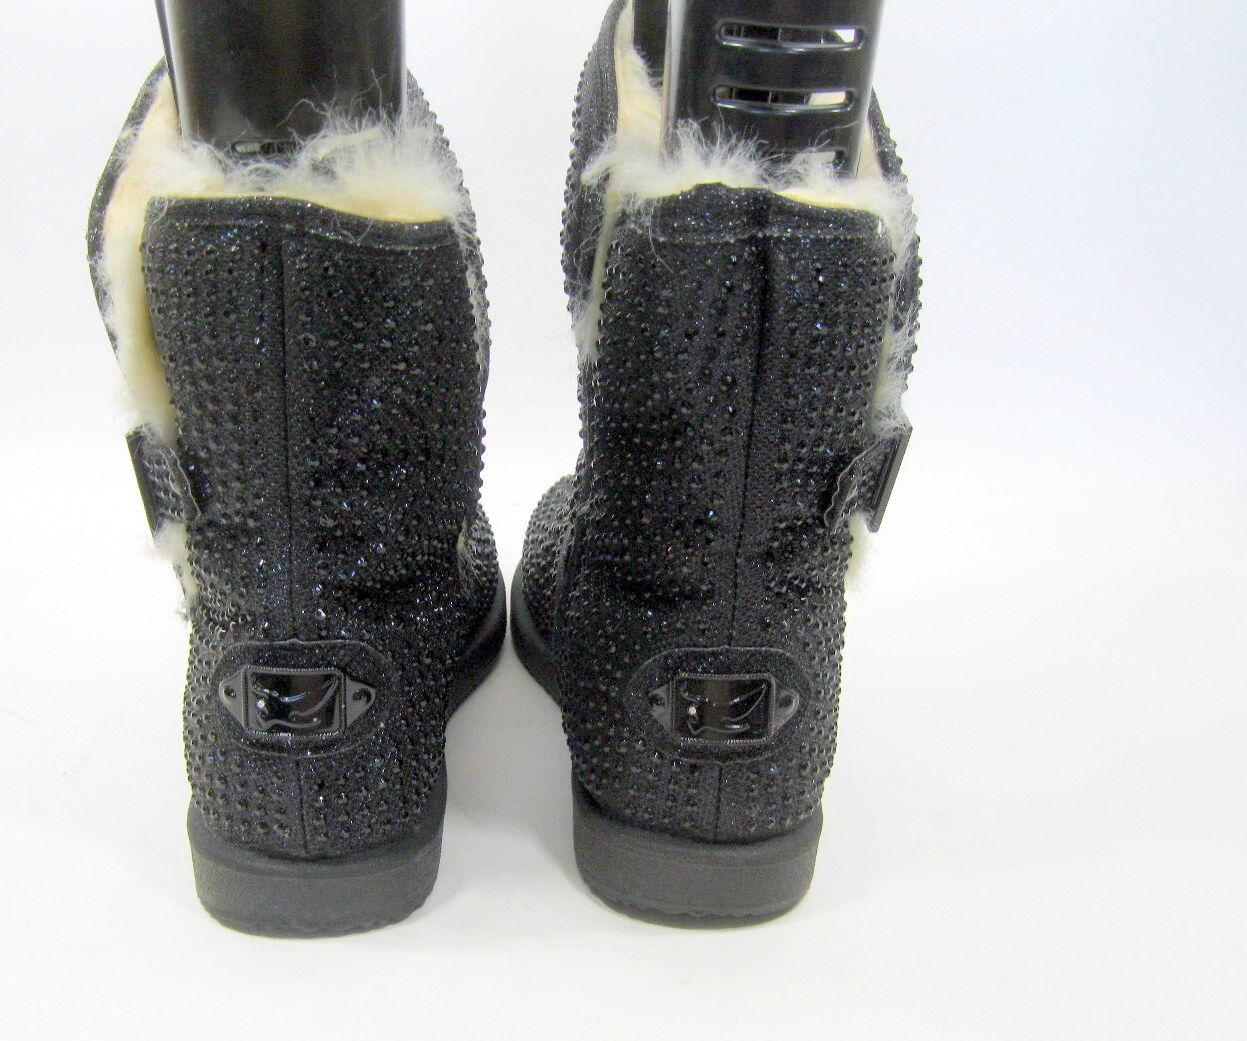 new ladies Black Urban Rhinestone Round Toe  Winter sexy Ankle Boot Size 8